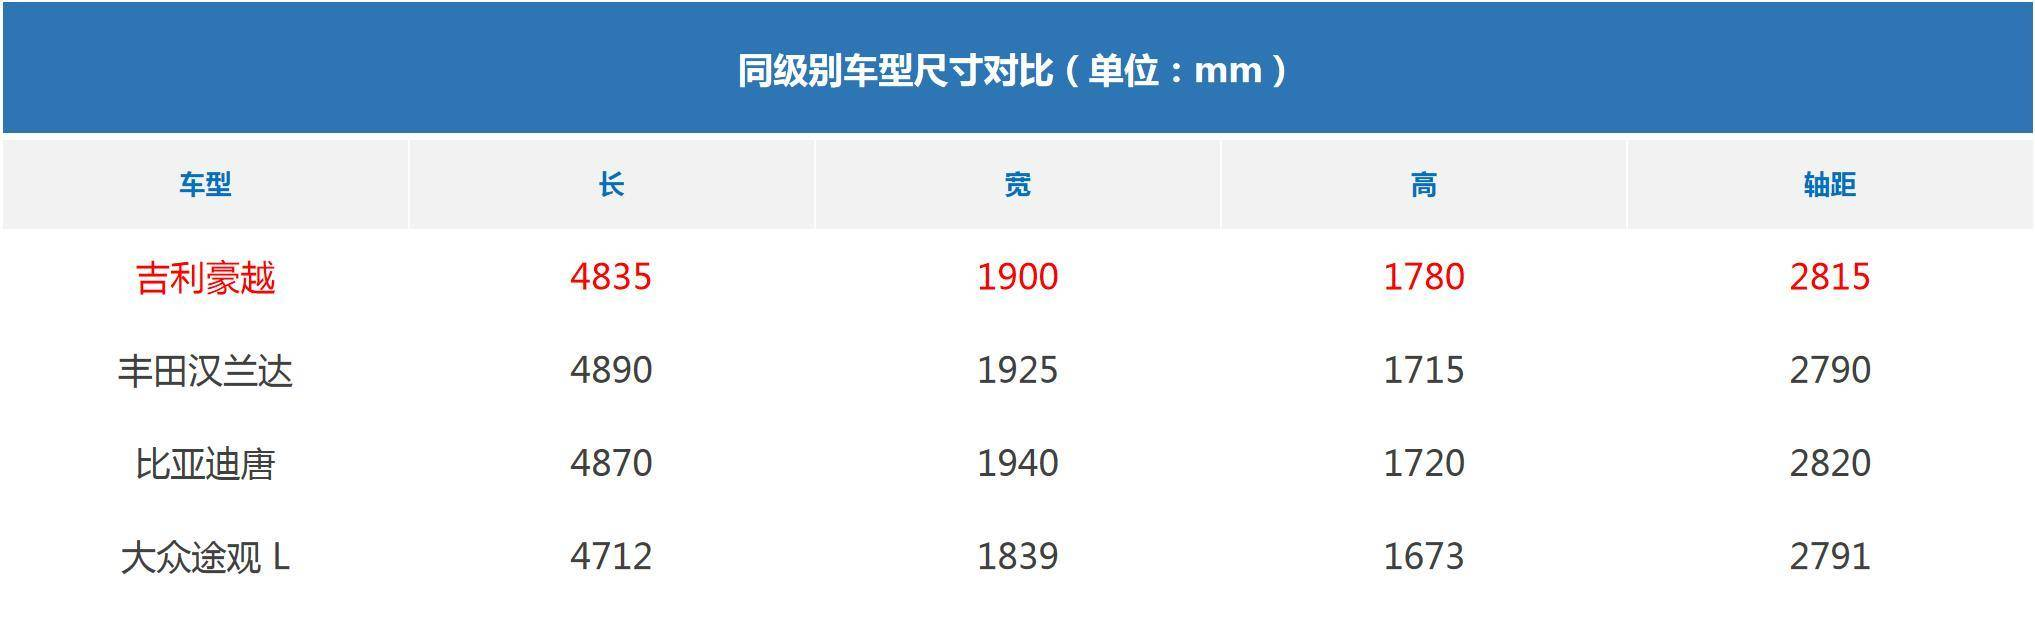 http://cools.qctt.cn/1578754384349.jpeg?imageMogr2/size-limit/1024k!